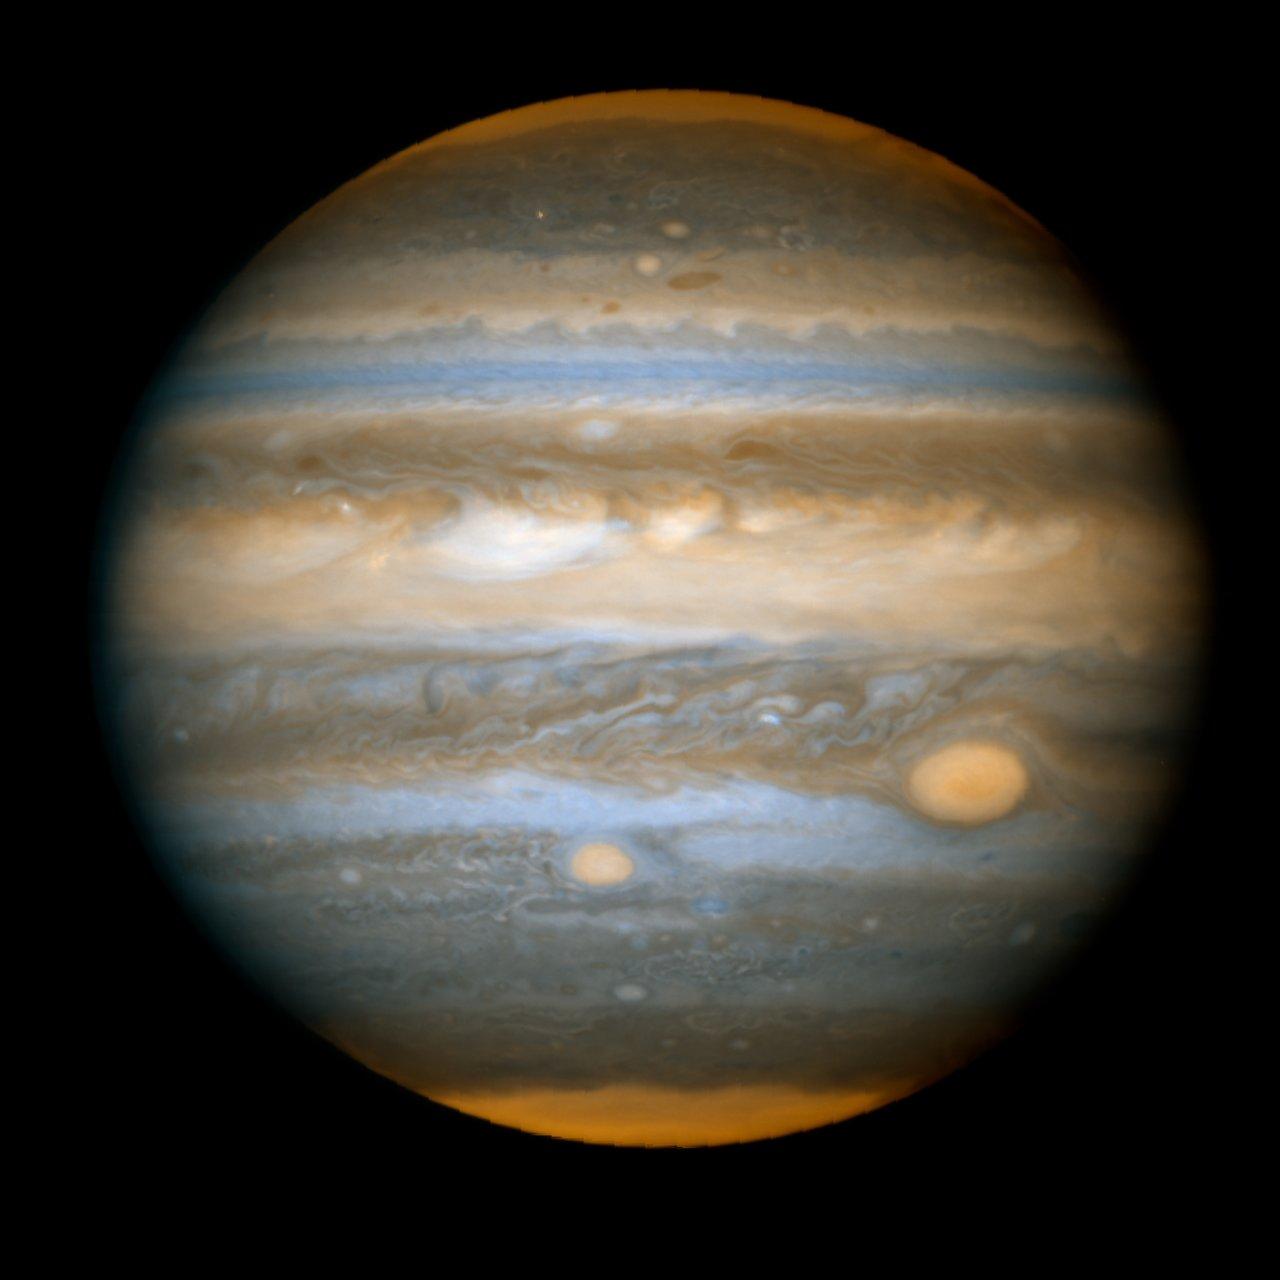 Jupiter's New Red Spot - HST ACS/WFC: April 16, 2006